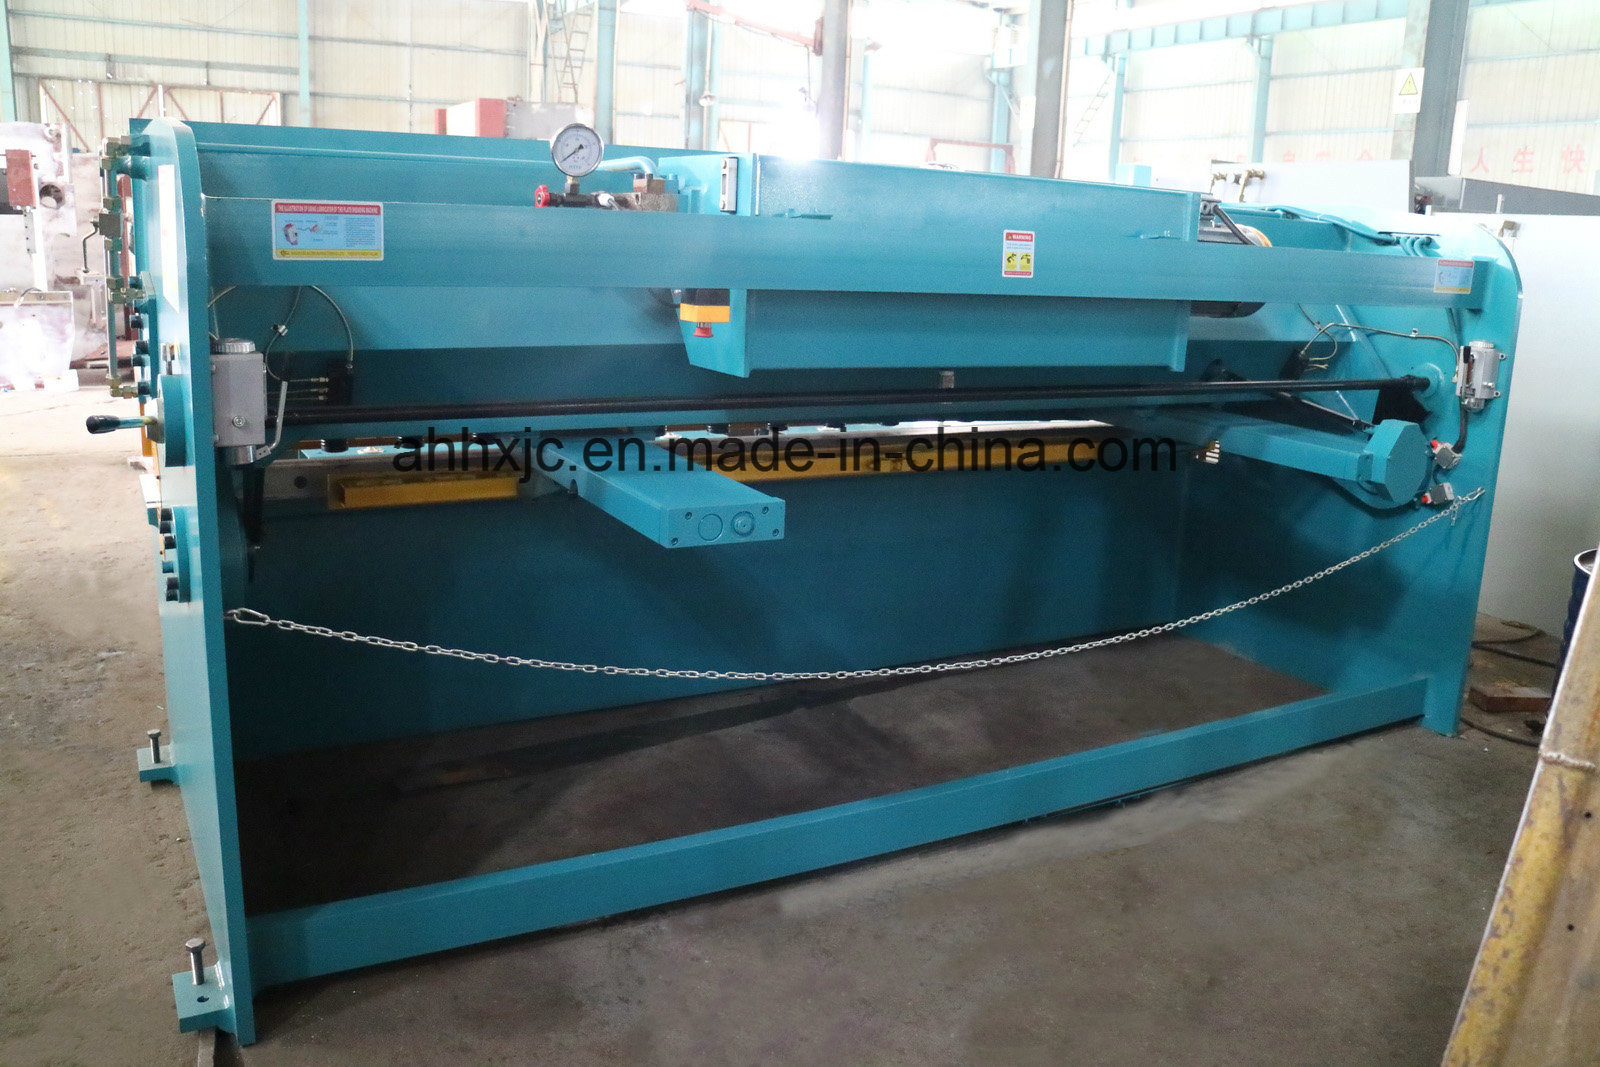 QC12k Nc Hydraulic Shearing Machine for Metal Making